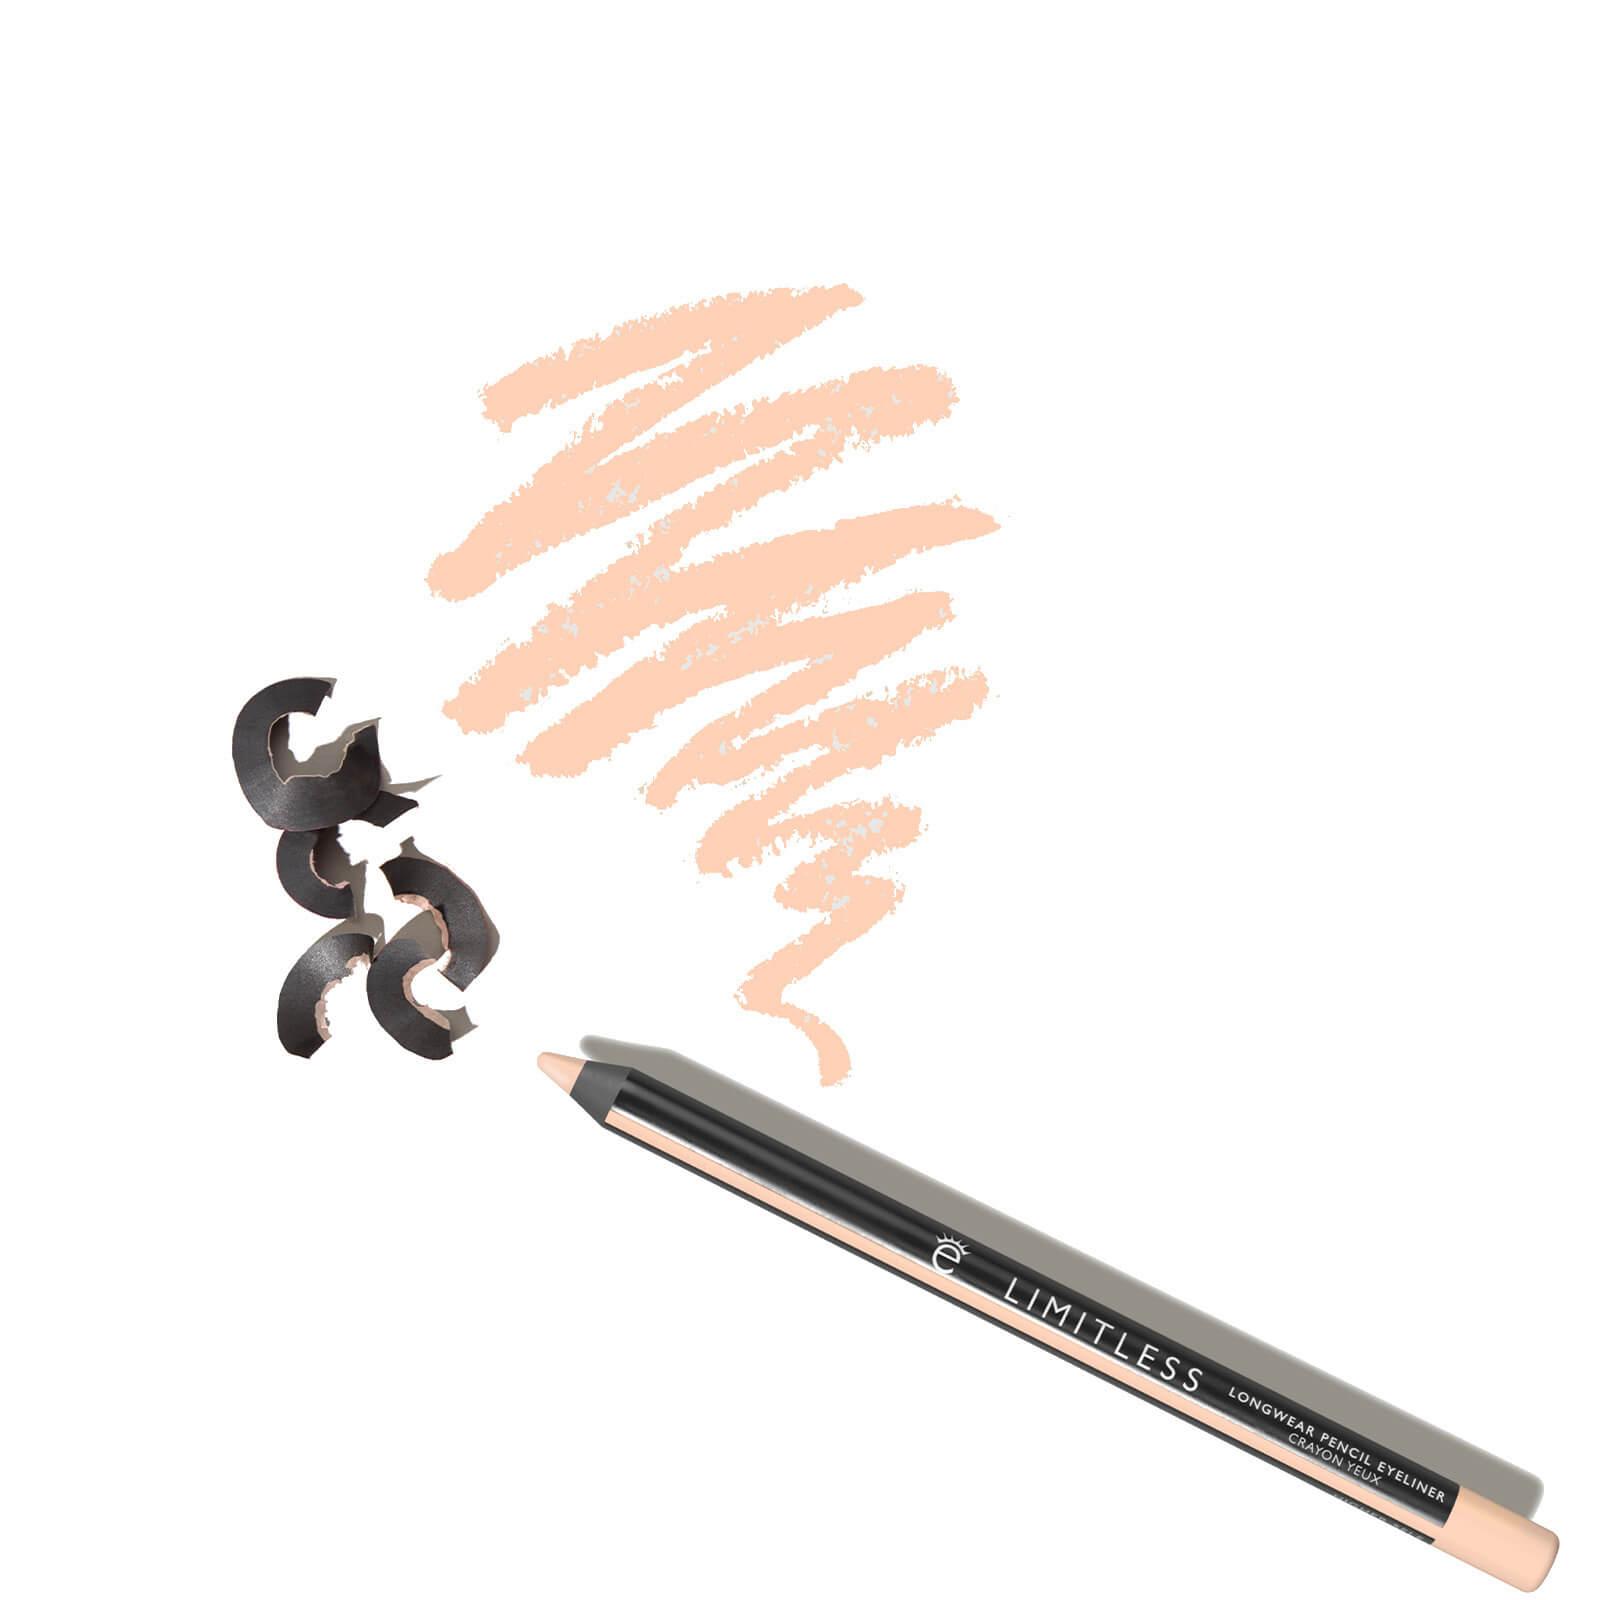 Cosmetics Limitless Long-Wear Pencil Eyeliner - Higher Self